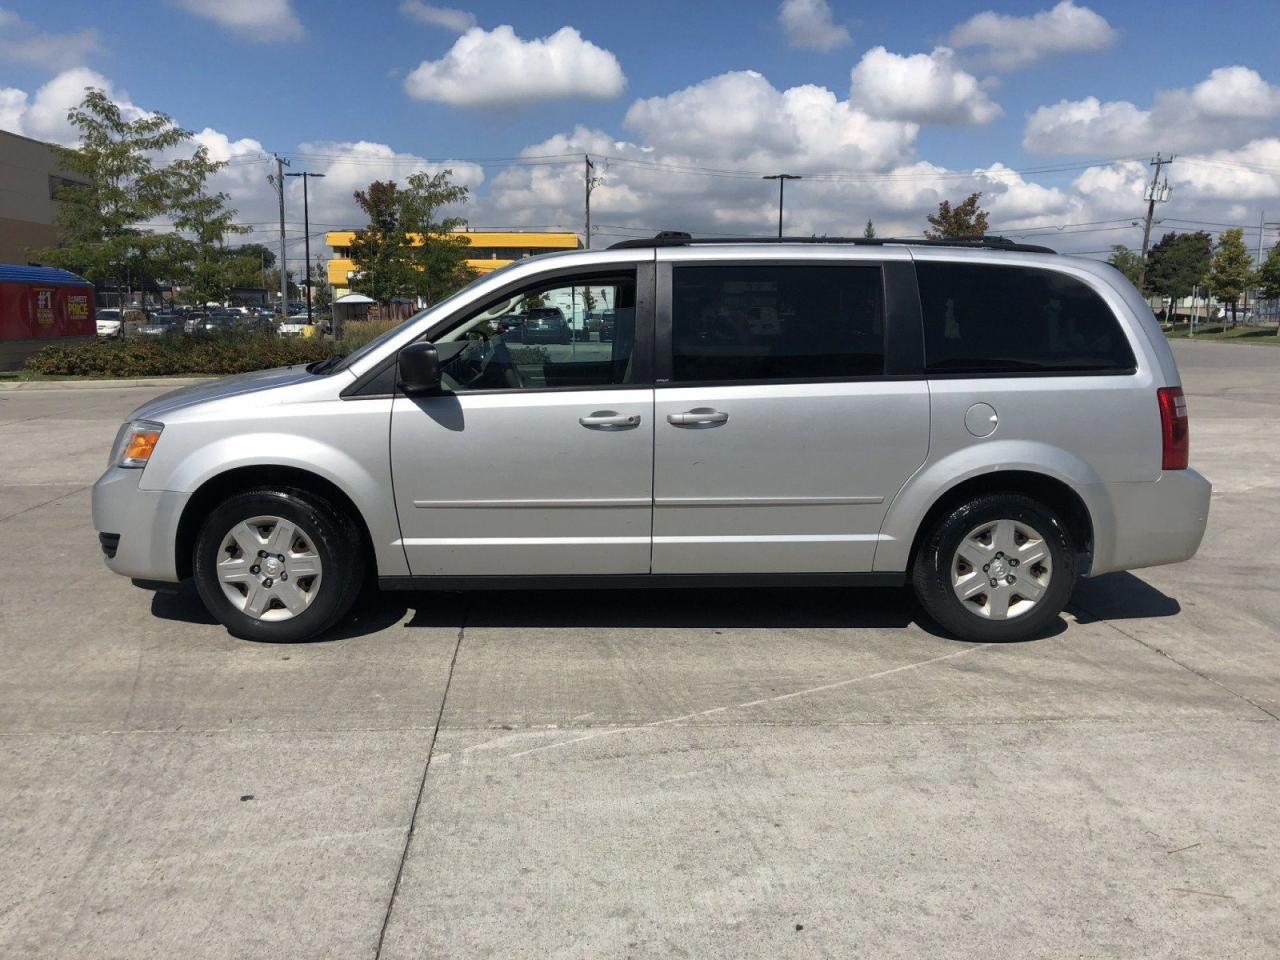 2009 Dodge Grand Caravan Stow & go, 7 Pass, 3/Y Warranty Avail